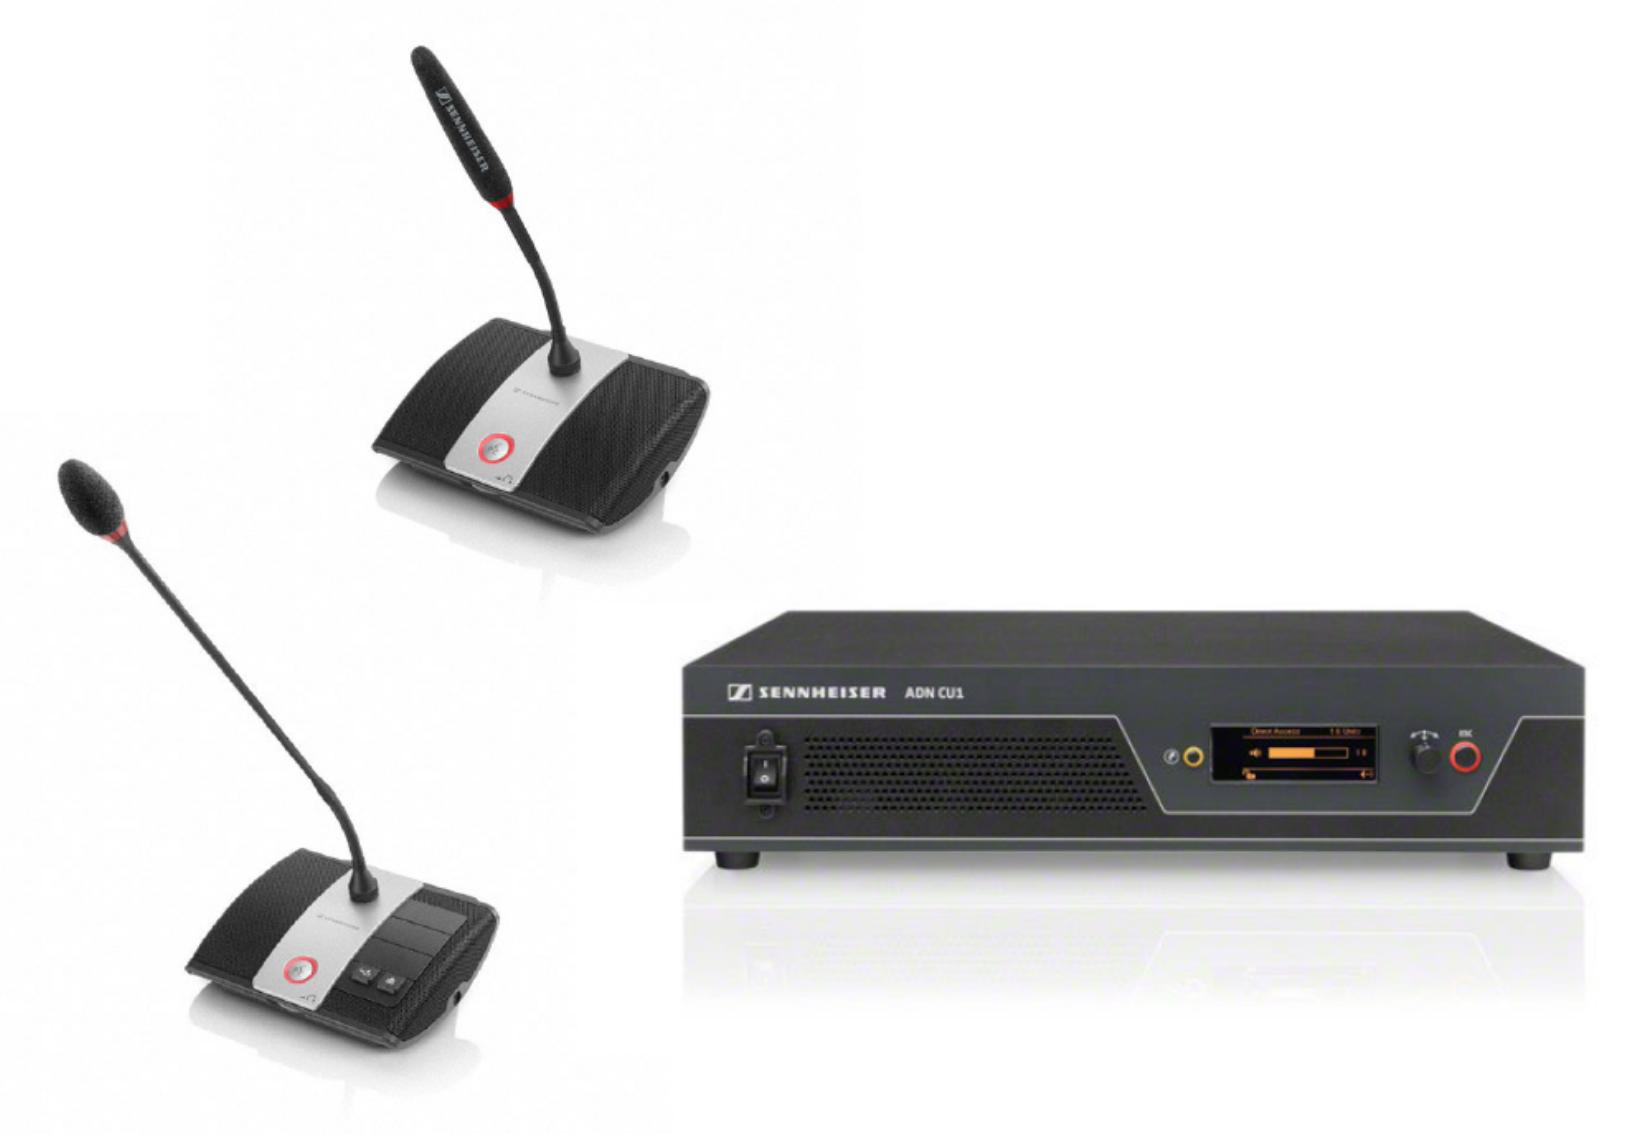 SENNHEISER SENNHEISER - Gamme Audio Distribution Network Wireless